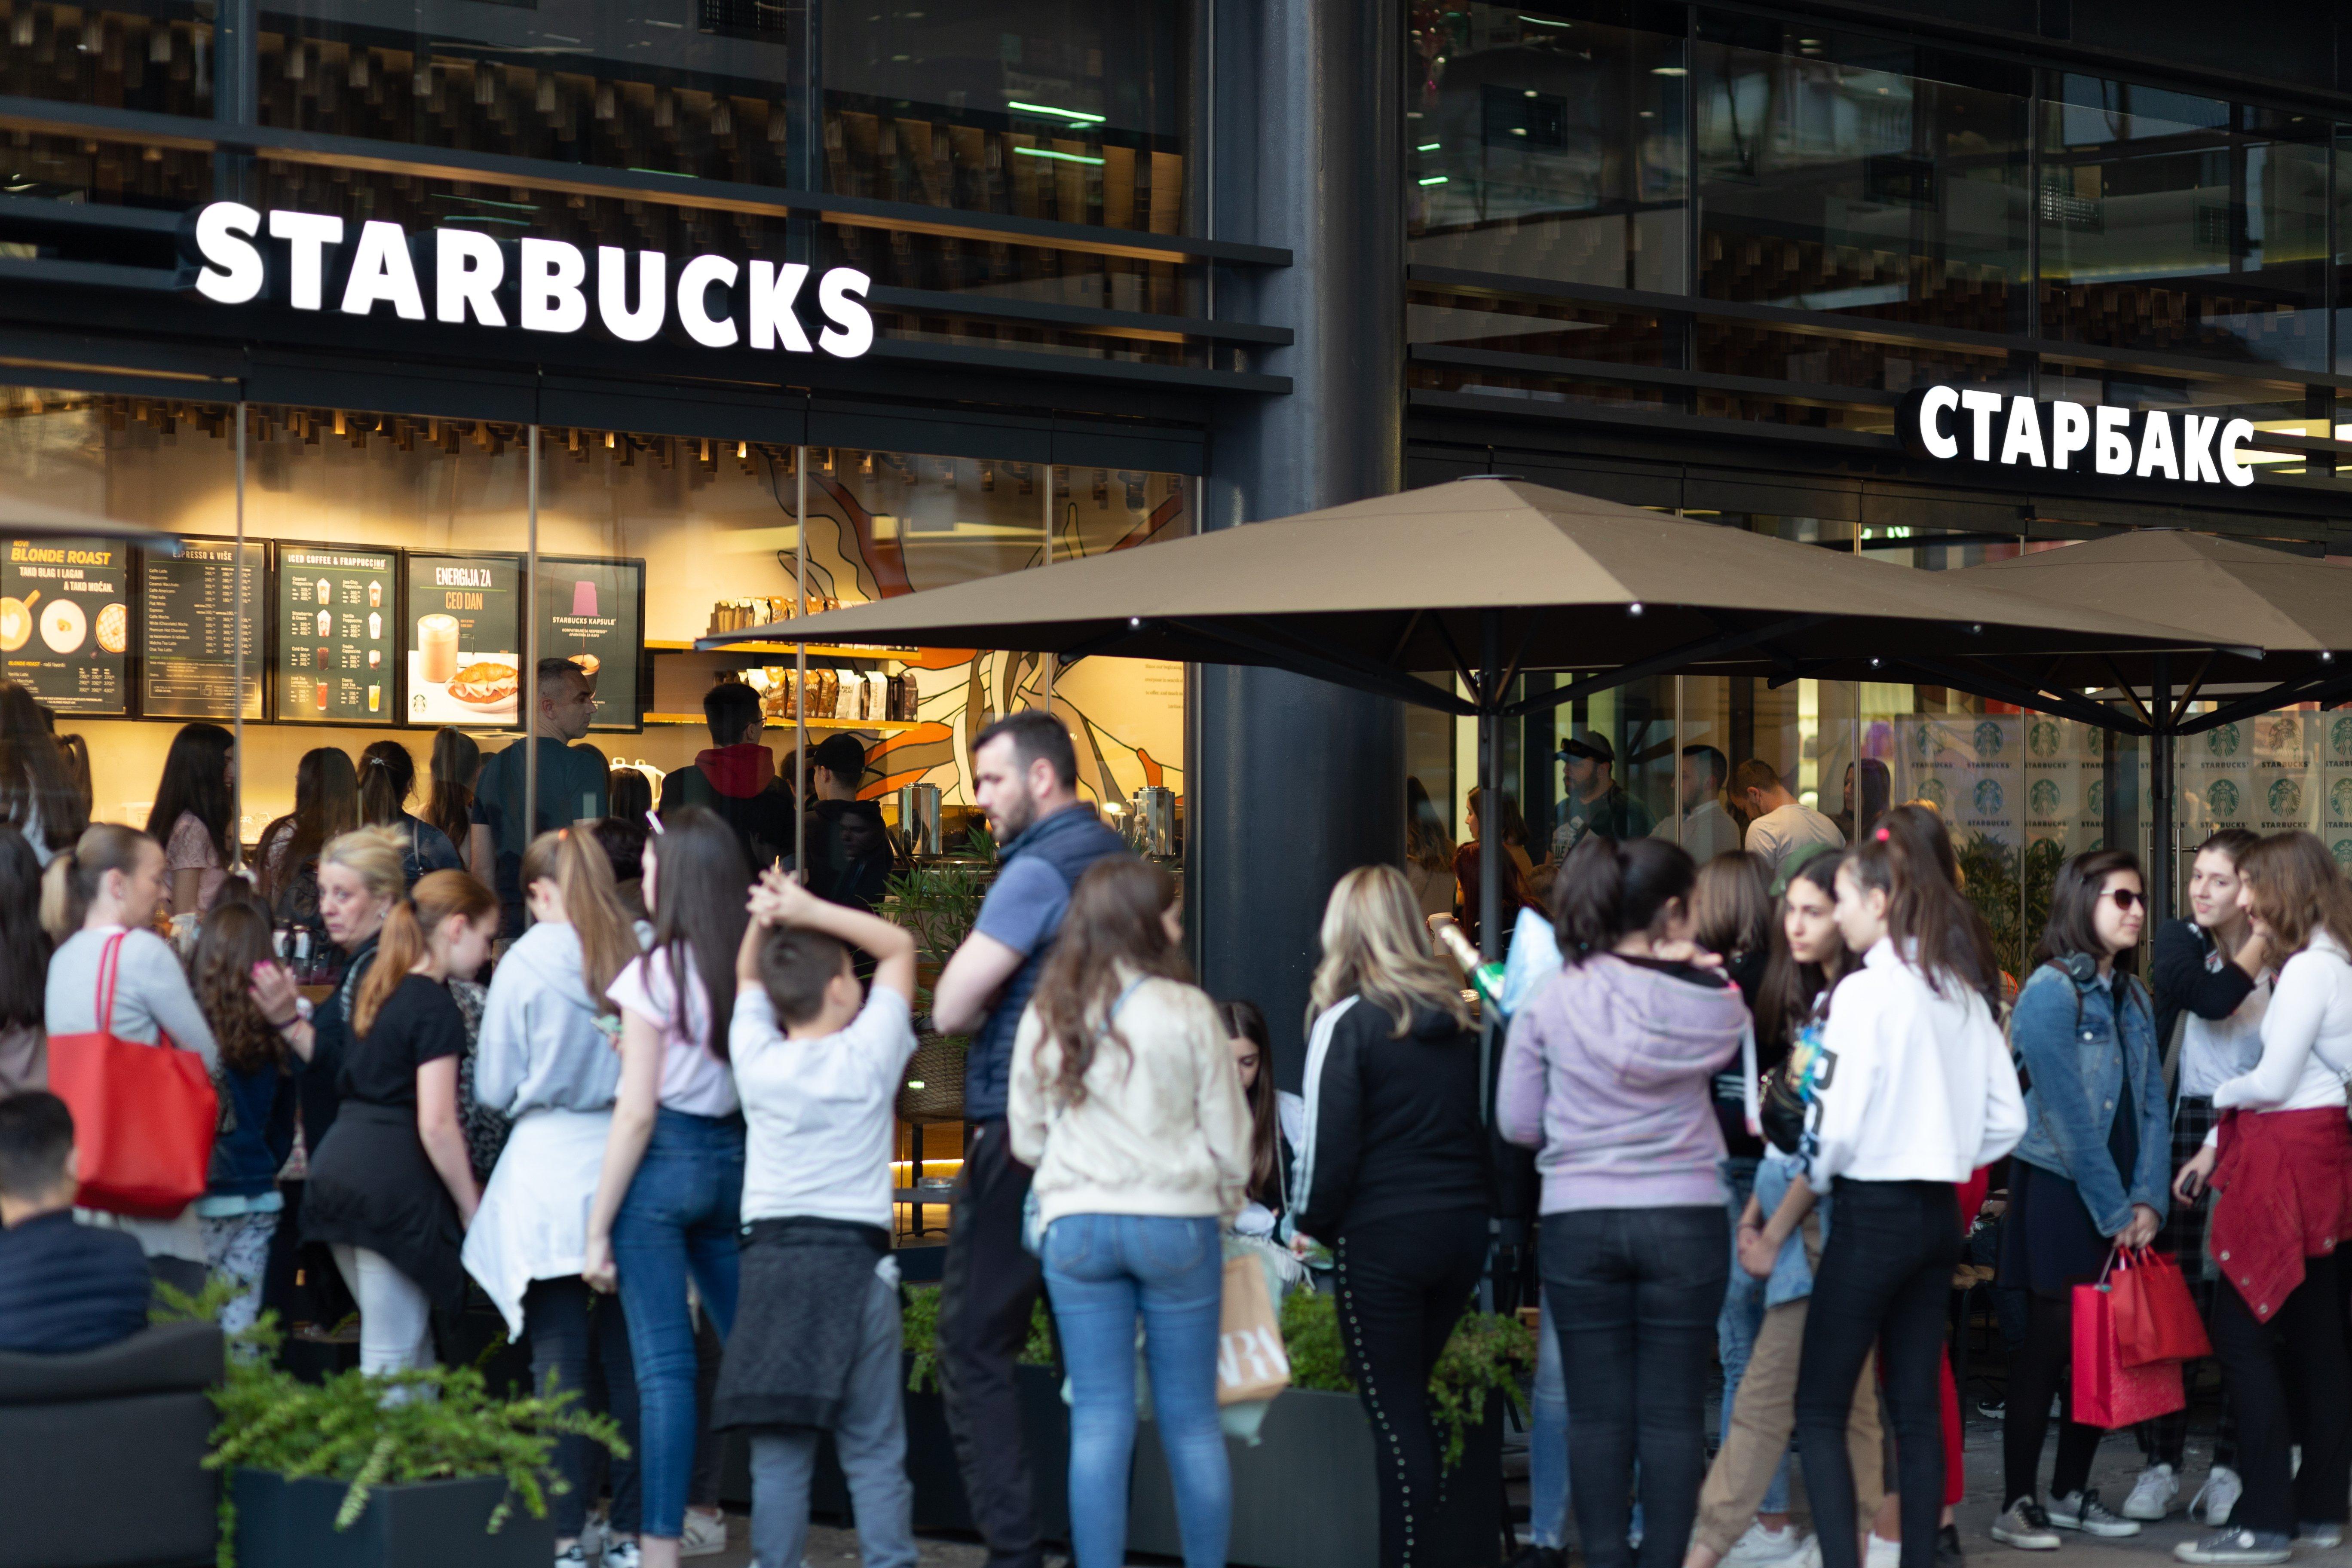 food service market research starbucks